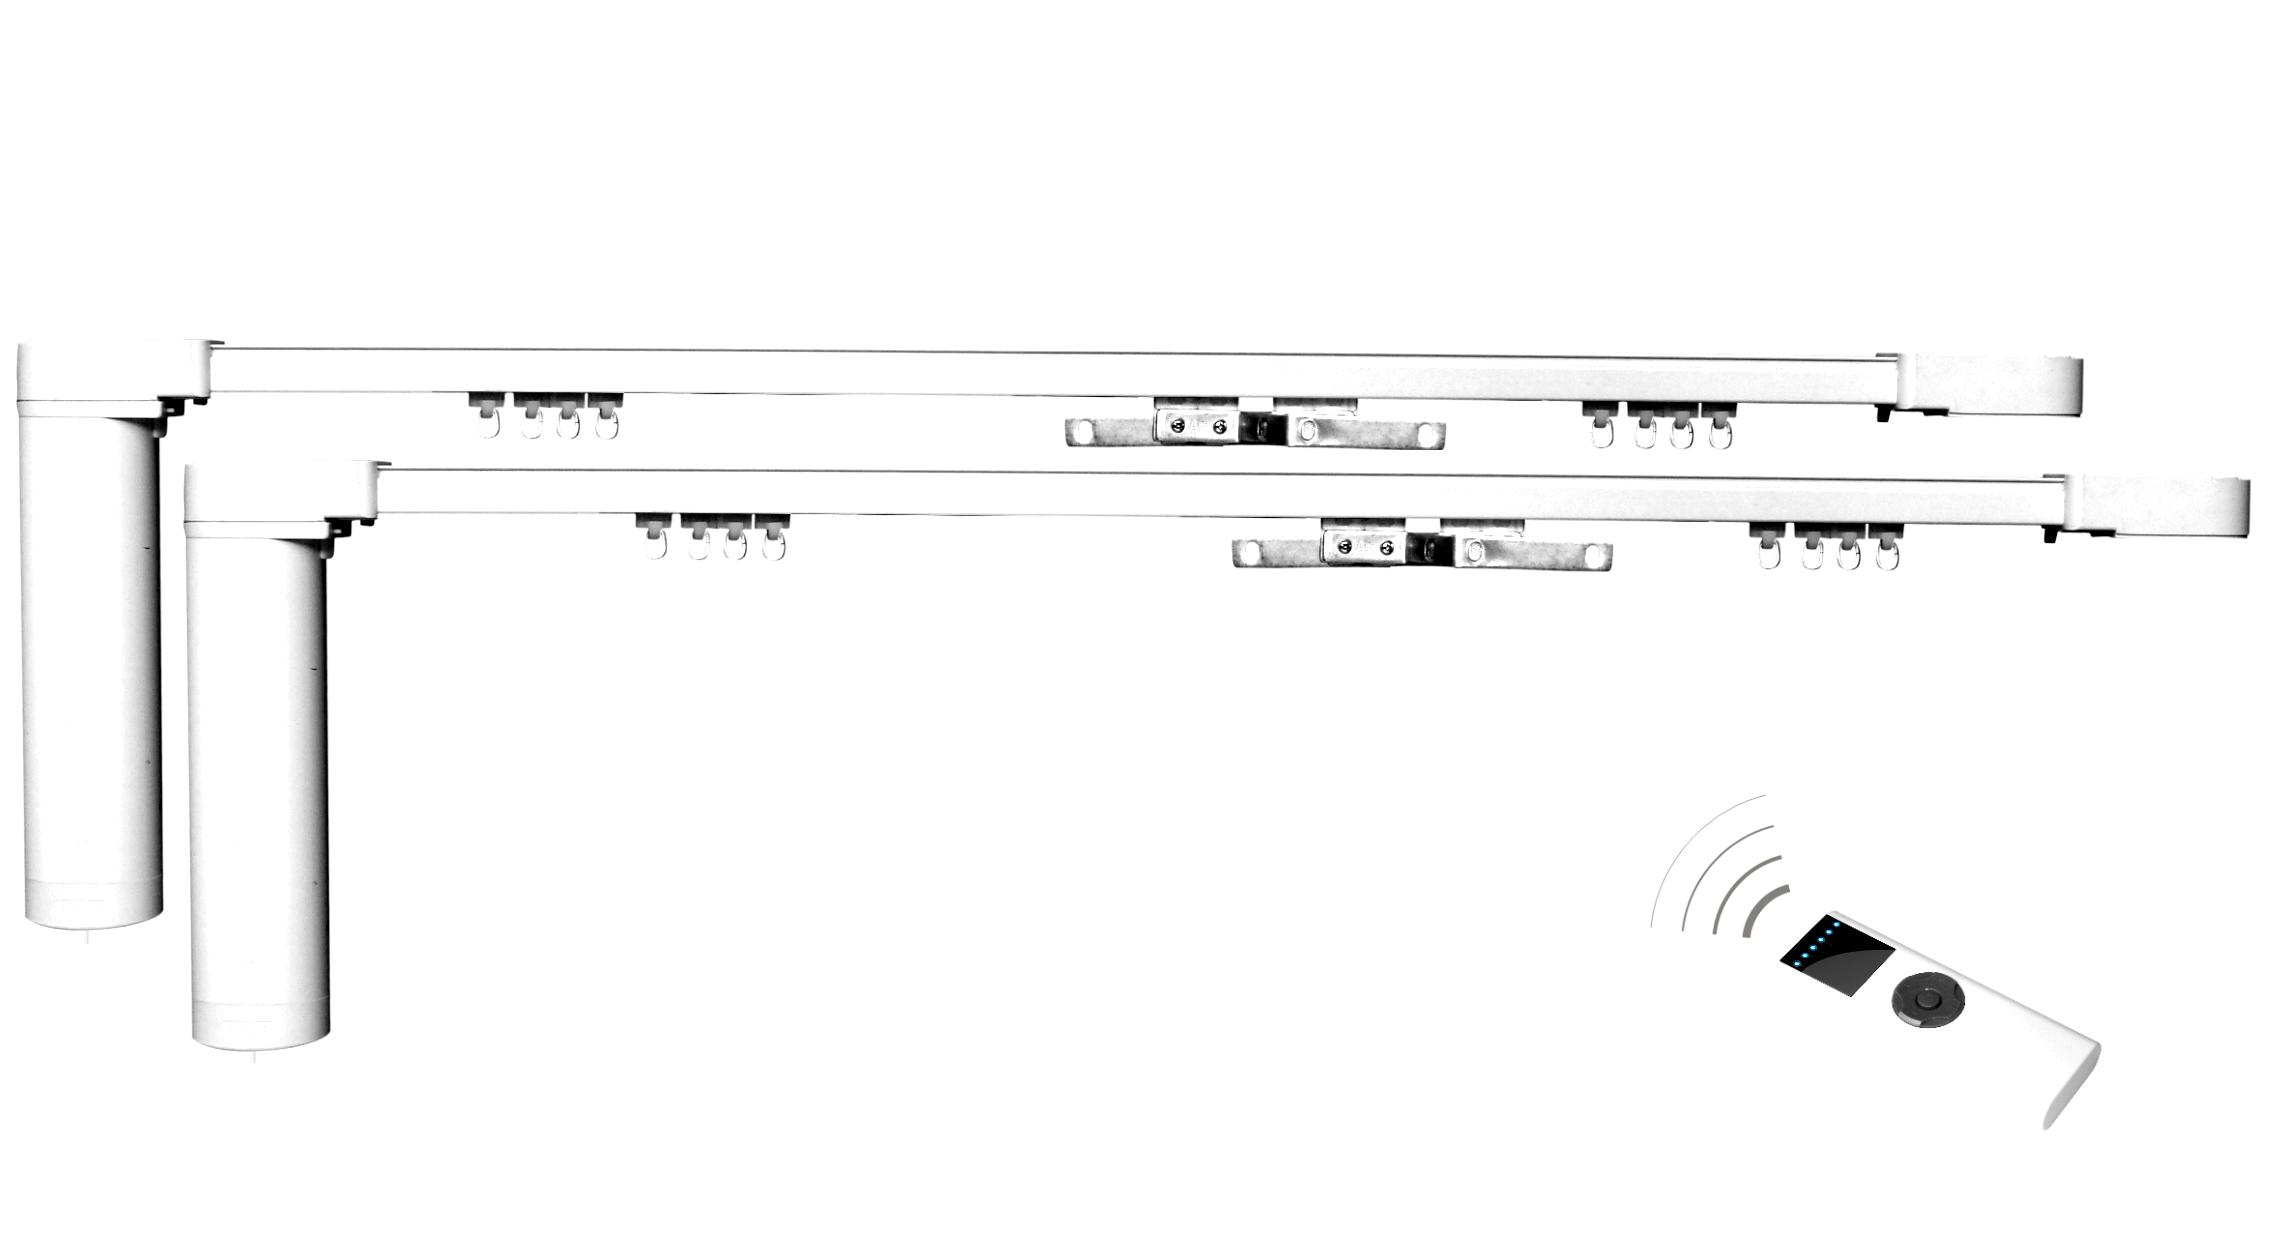 Remote Motorized Belt Drive Electric Curtain Rail Track CL200BT